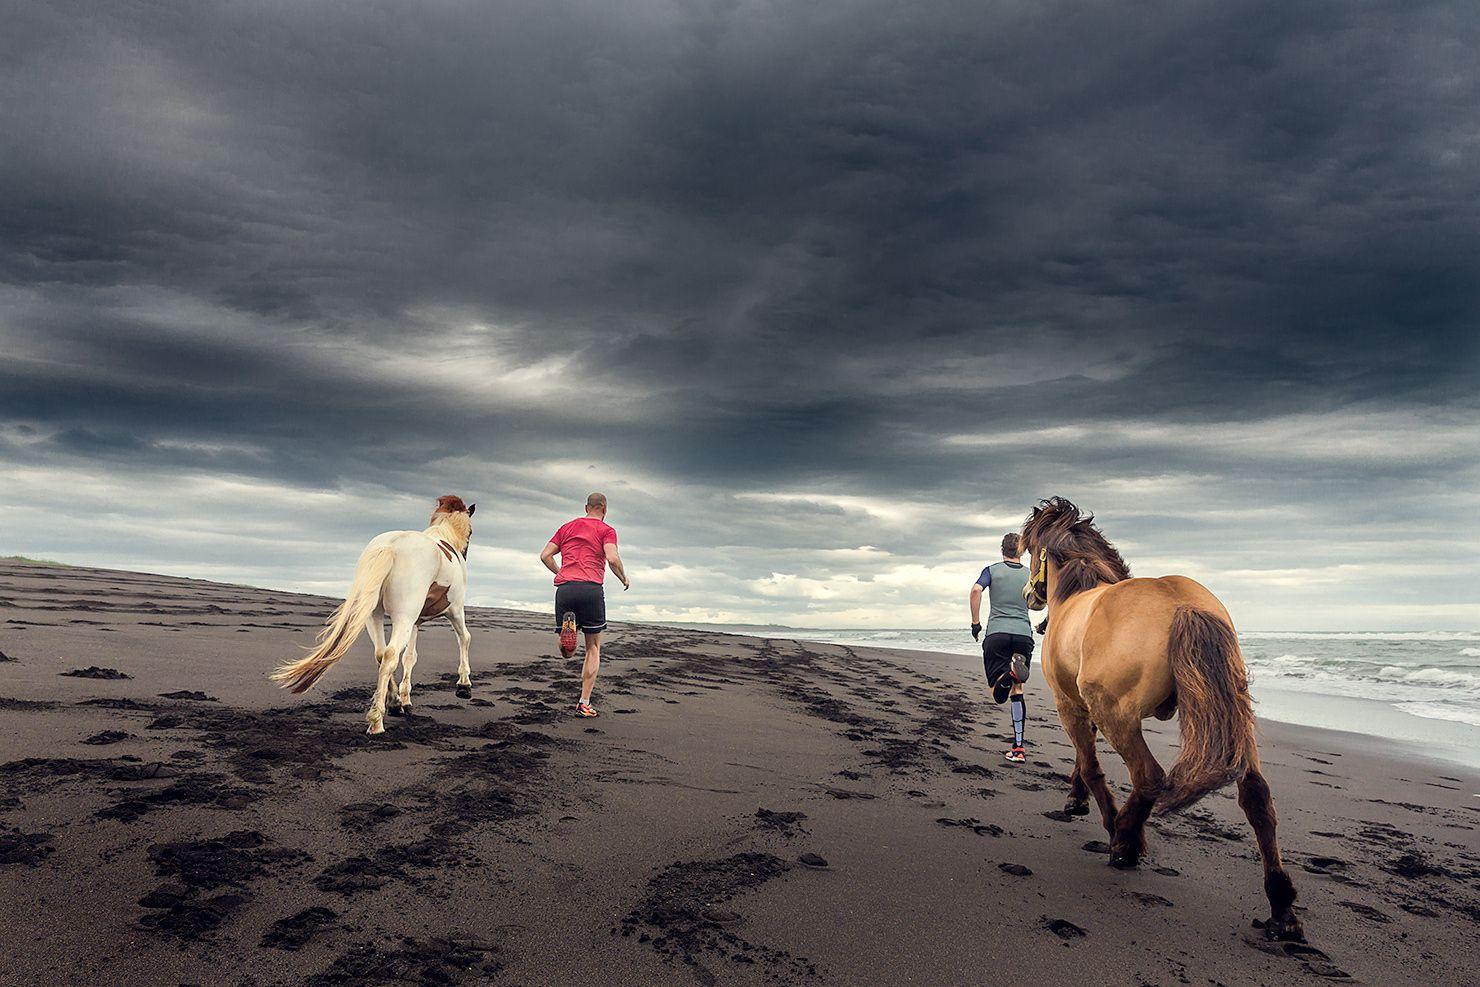 Photograph Man Vs Horse By Bragi Kort On 500px Description Ingo